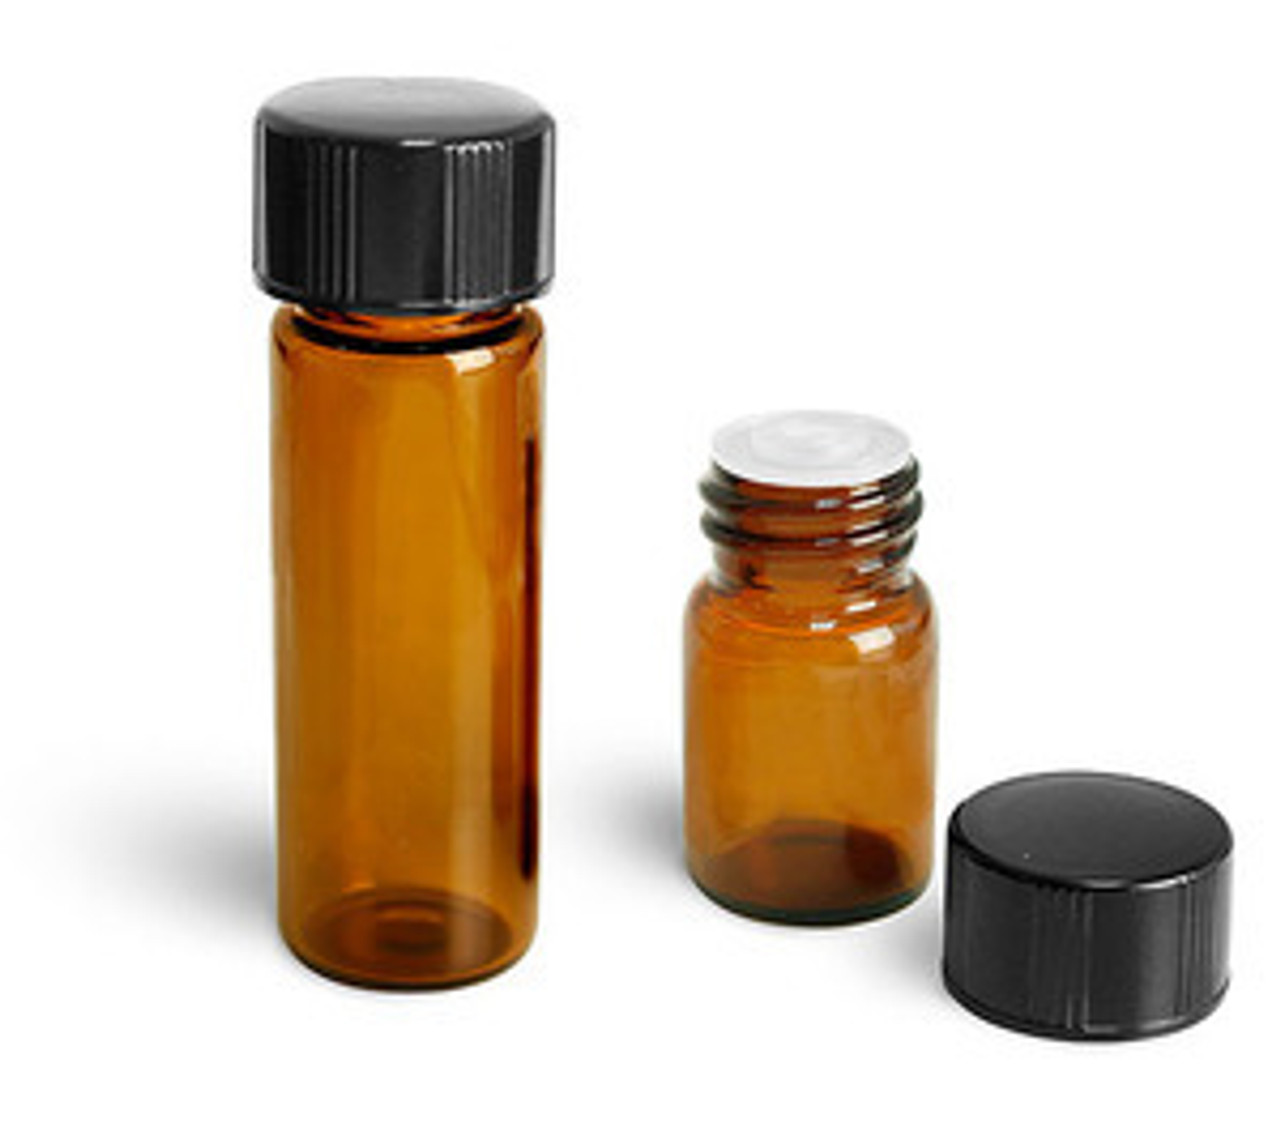 1/4 Dram Vials with Orifice Reducer